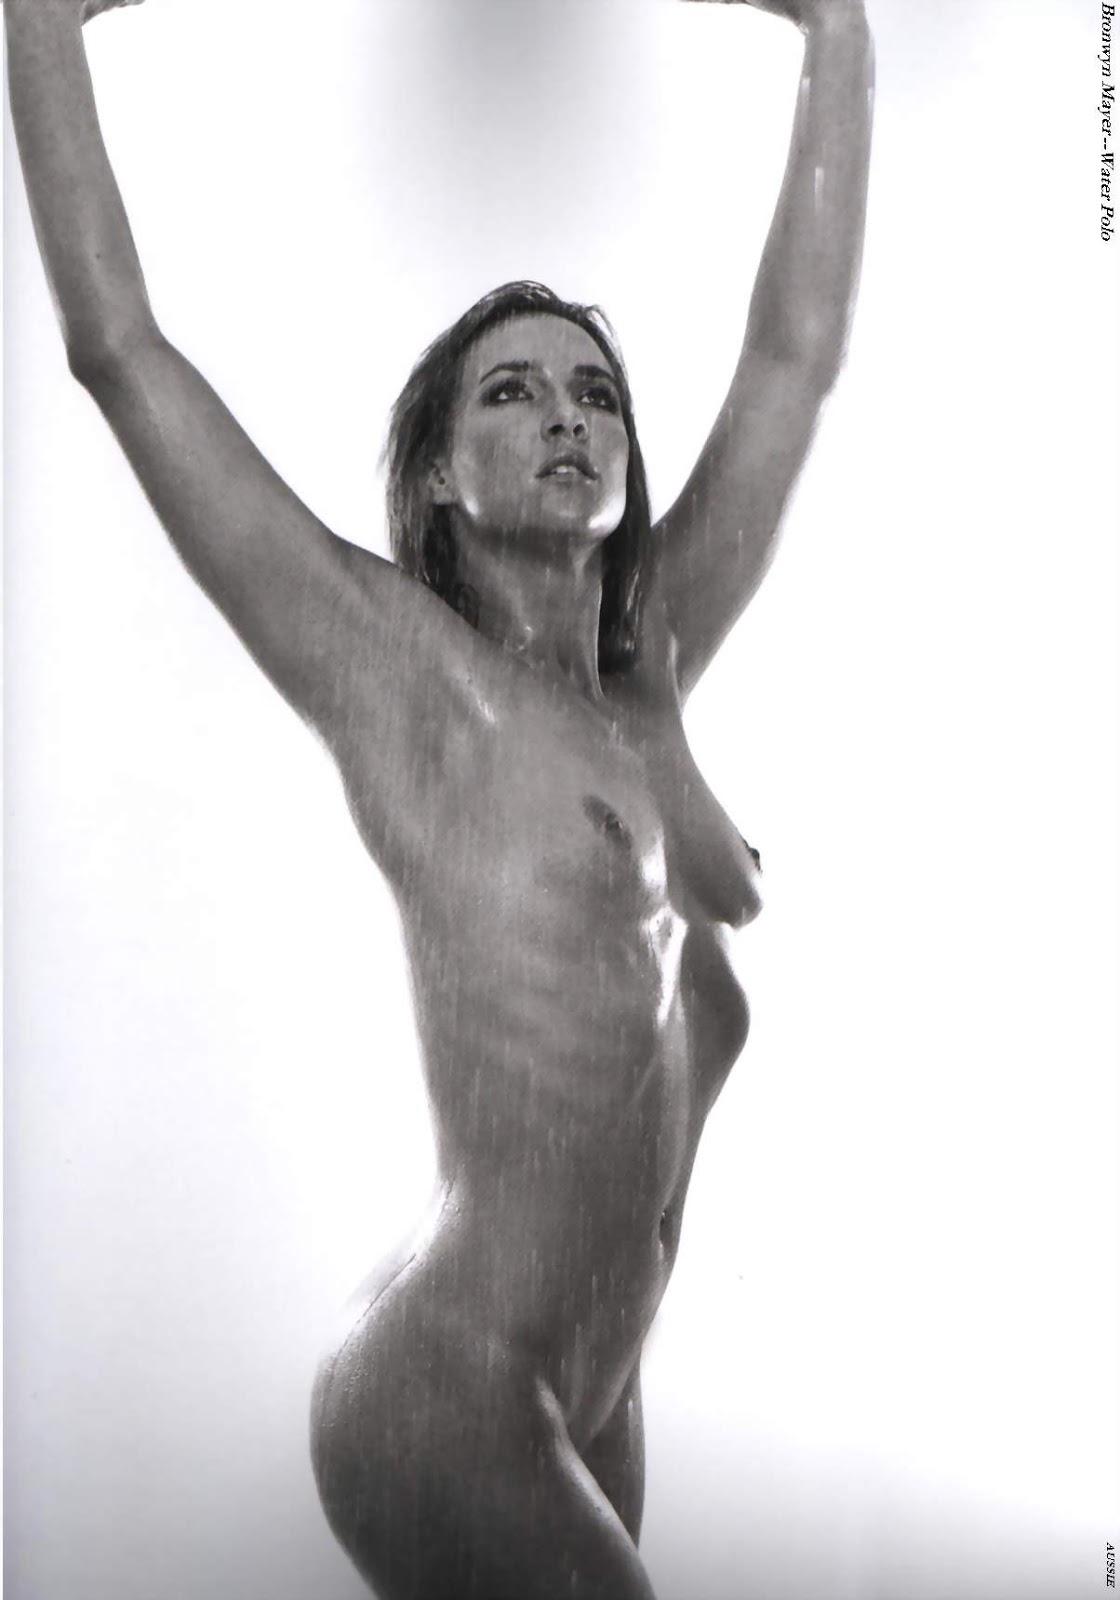 bronwyn mayer nude